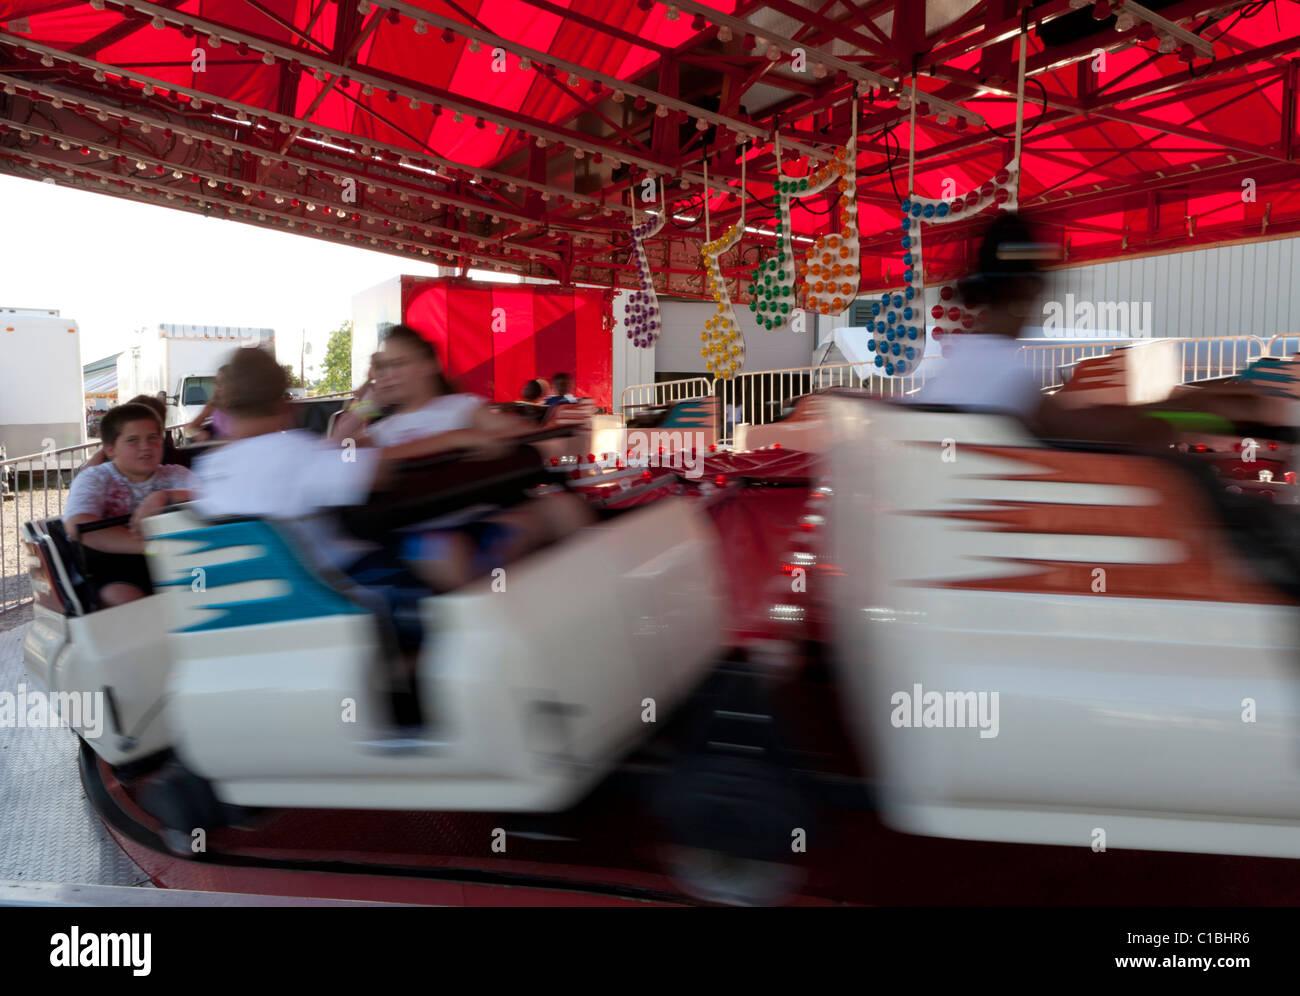 People enjoying an amusement park ride. - Stock Image